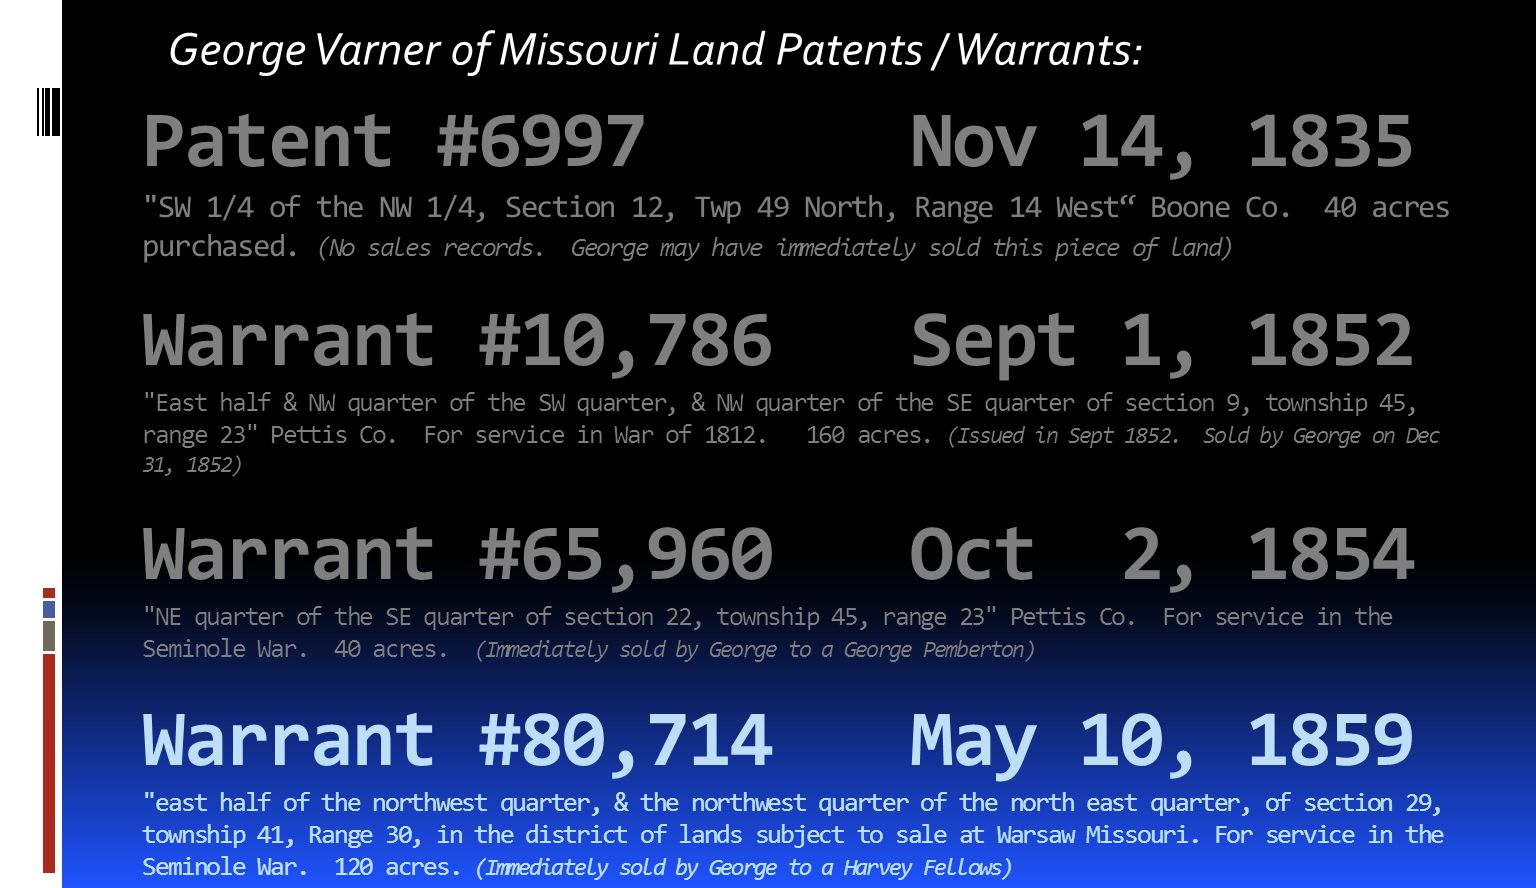 George Varner of Missouri War of 1812 Record: